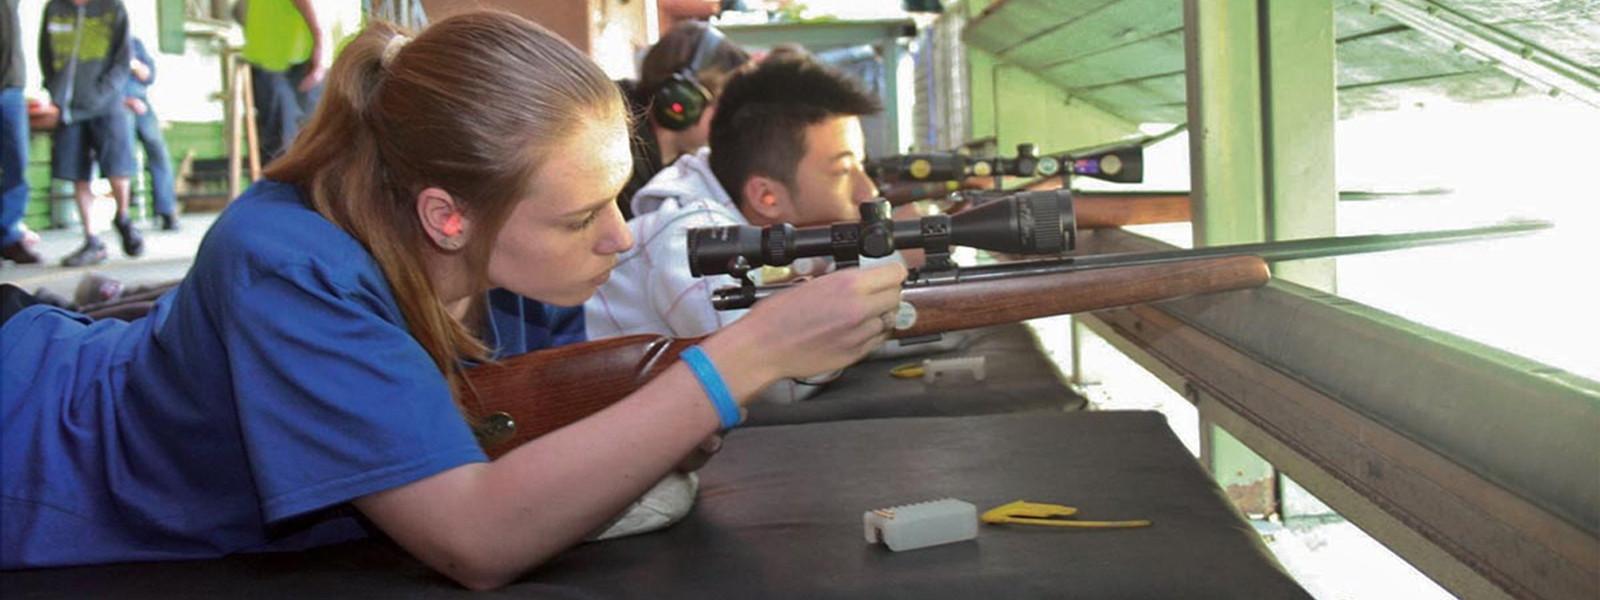 Rifle Ranges